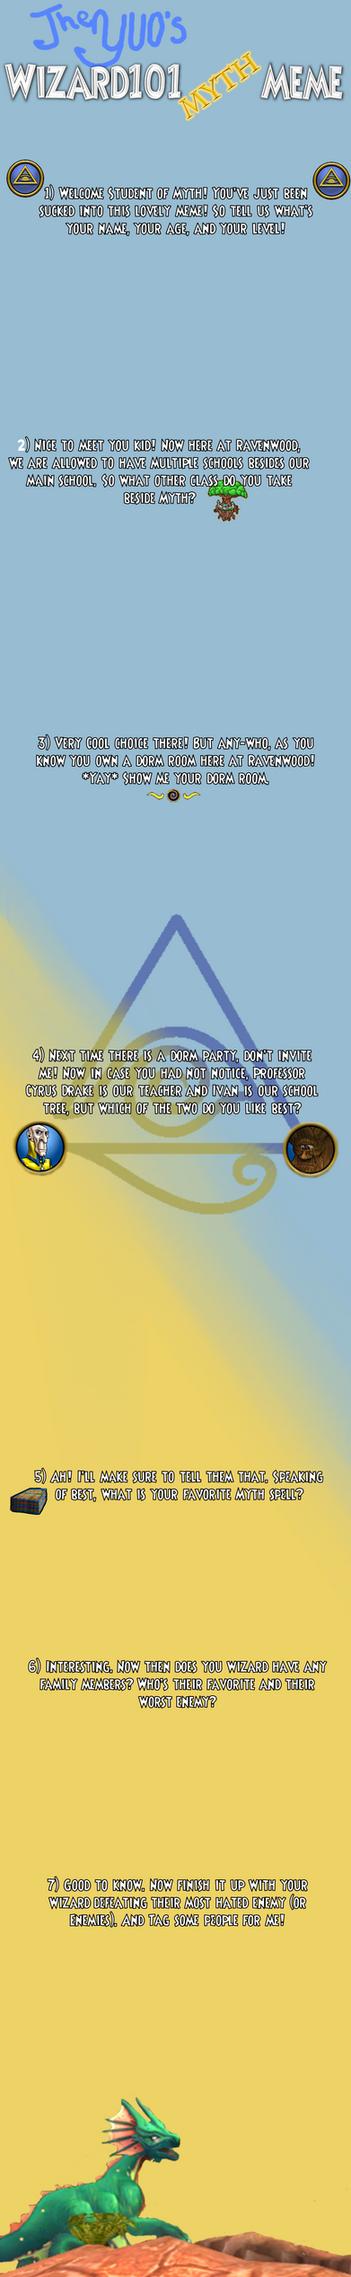 wizard101 myth meme by theyuo on deviantart